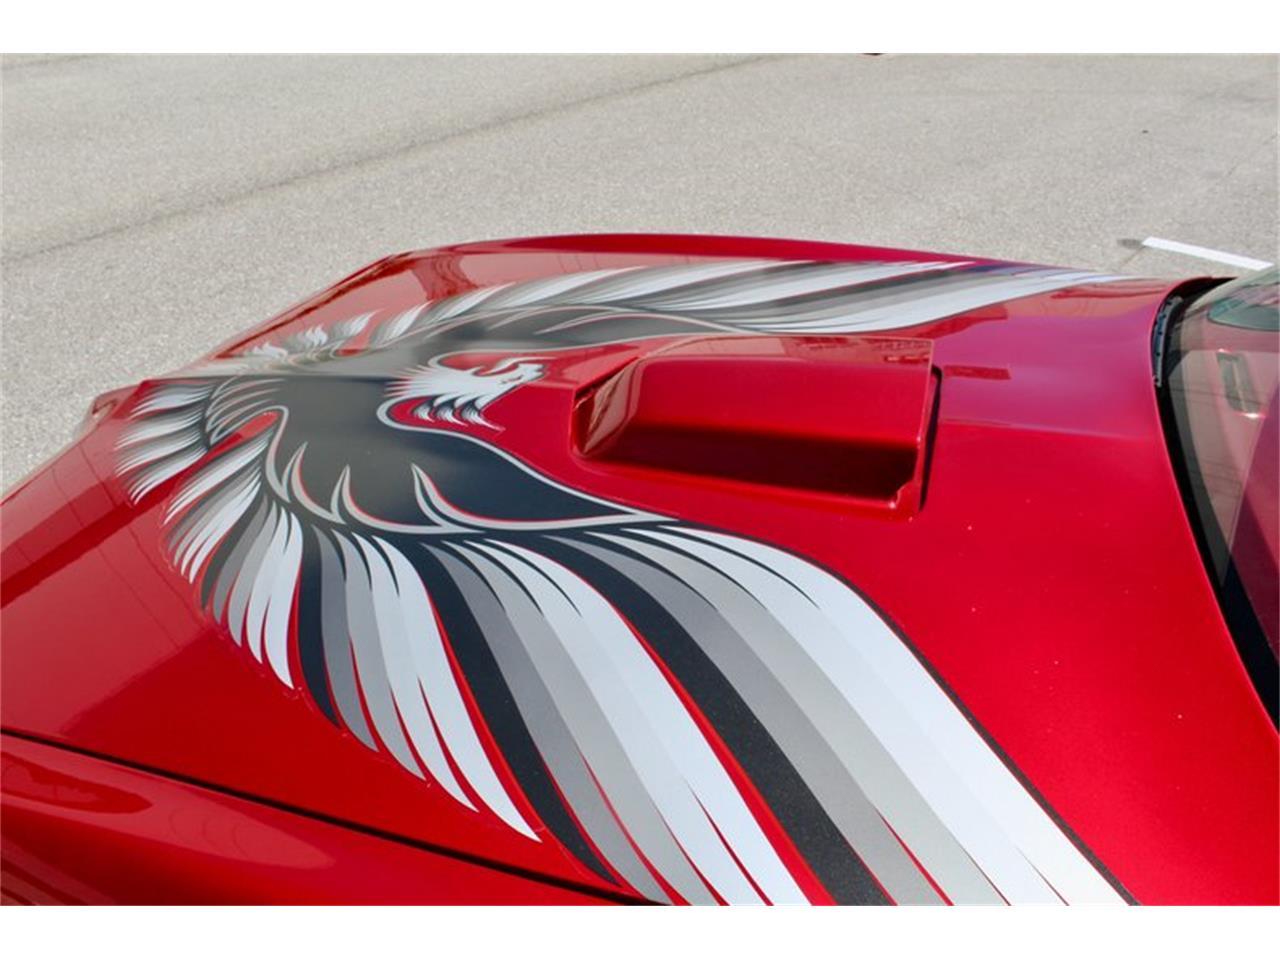 1980 Pontiac Firebird Trans Am (CC-1336805) for sale in Sarasota, Florida